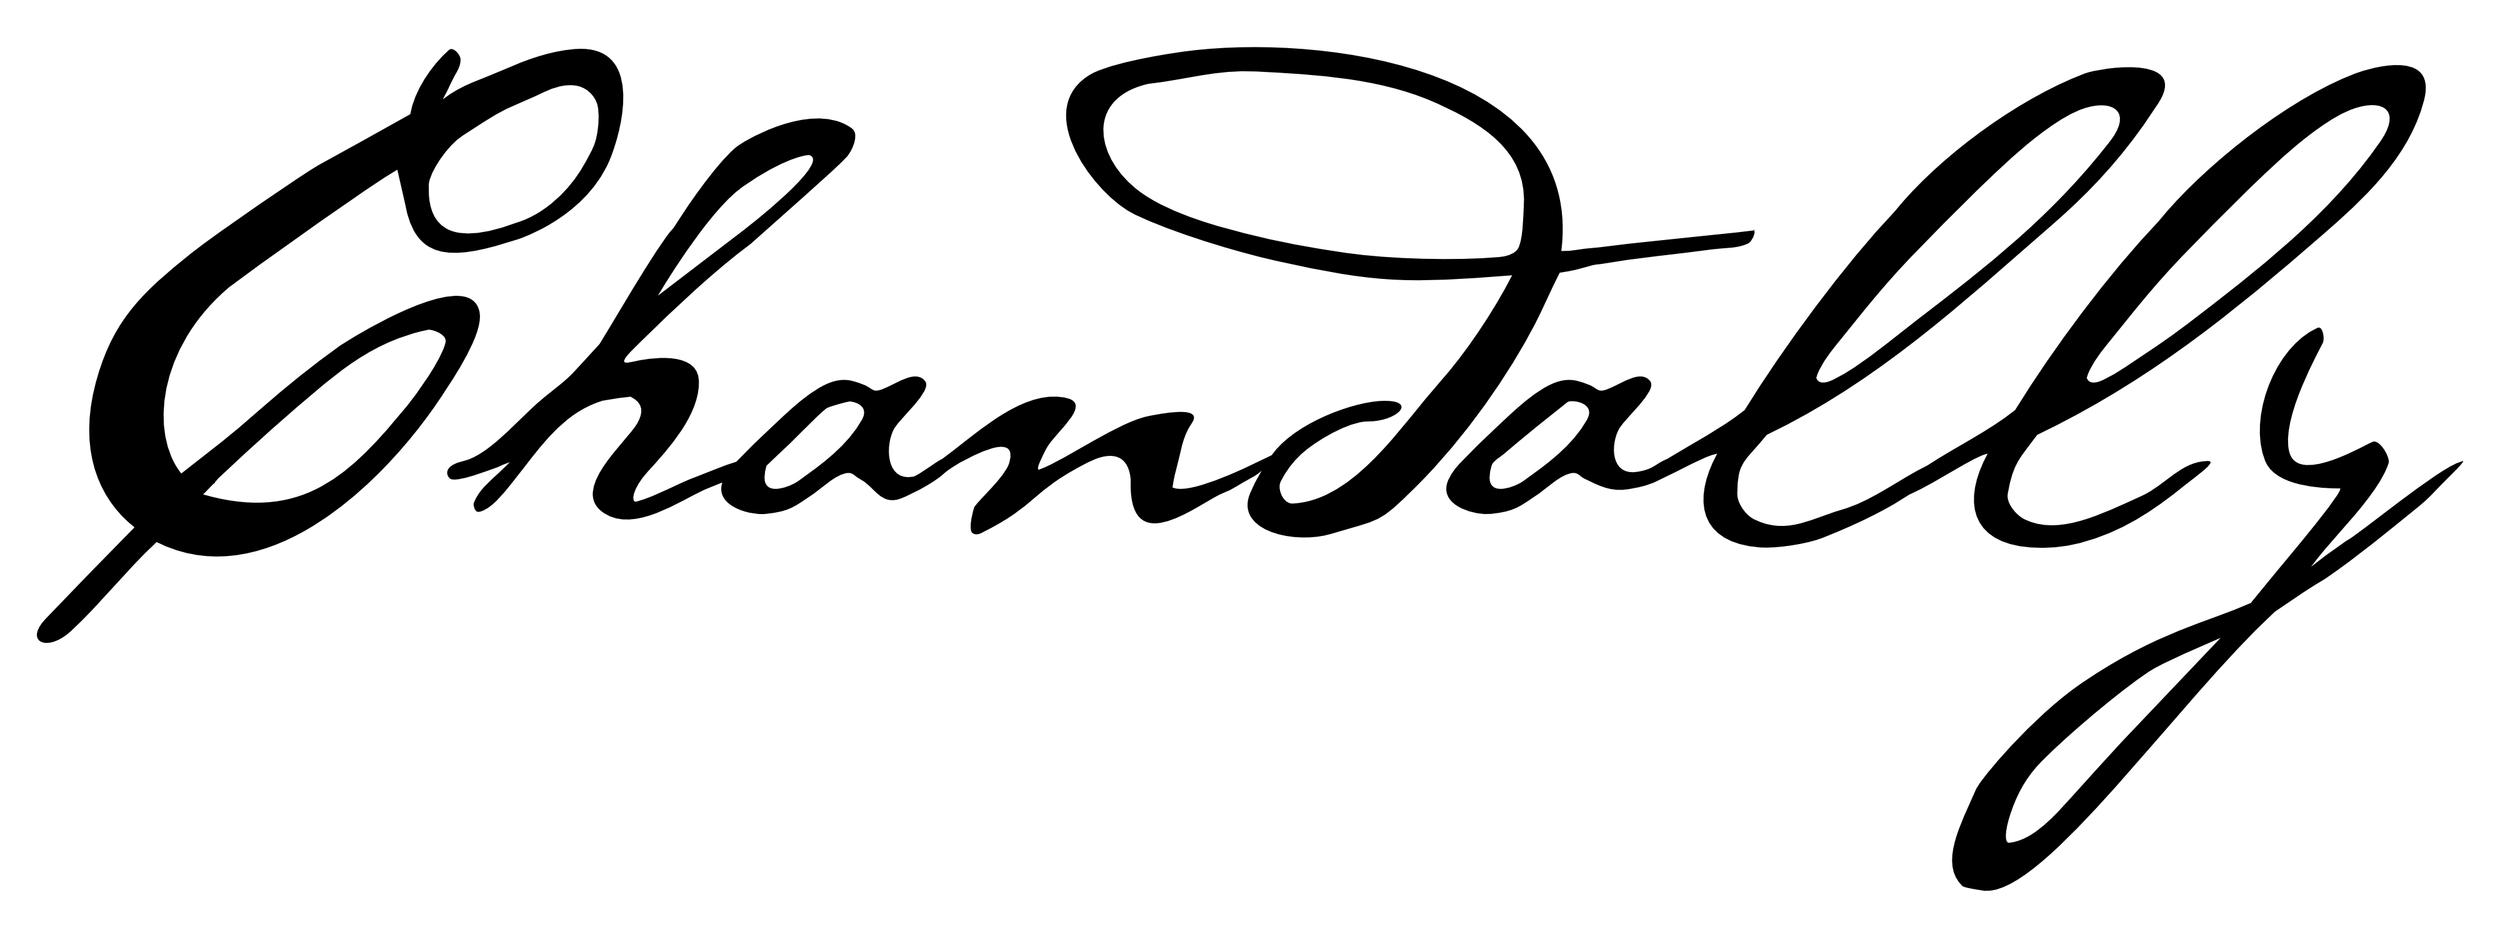 Chandally - Logo - Sharon Chandally Pedrini.png